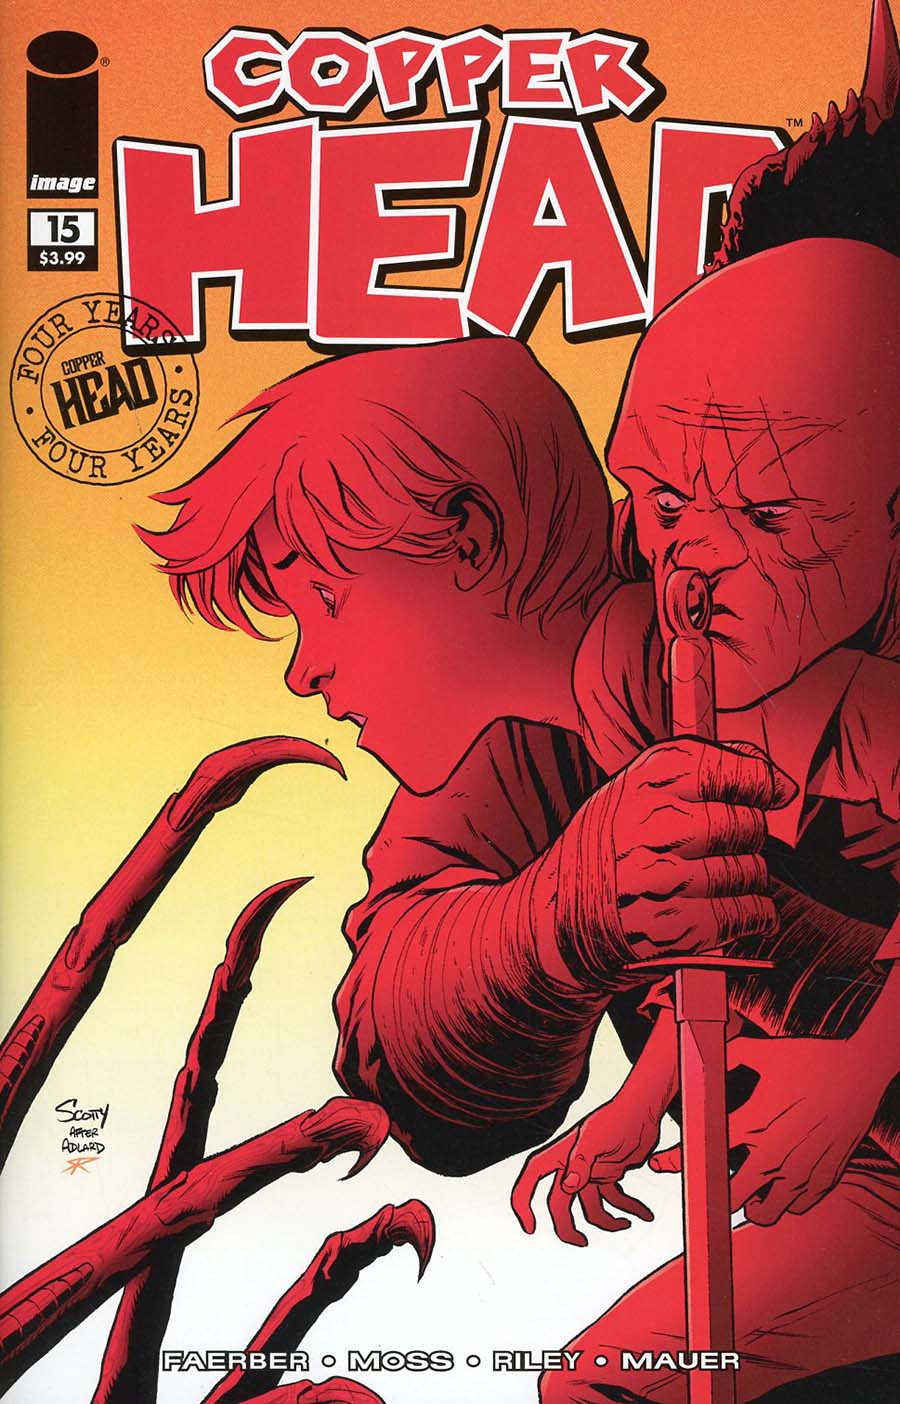 Copperhead #15 Cover B Variant Scott Godlewski & Ron Riley Walking Dead 58 Tribute Color Cover